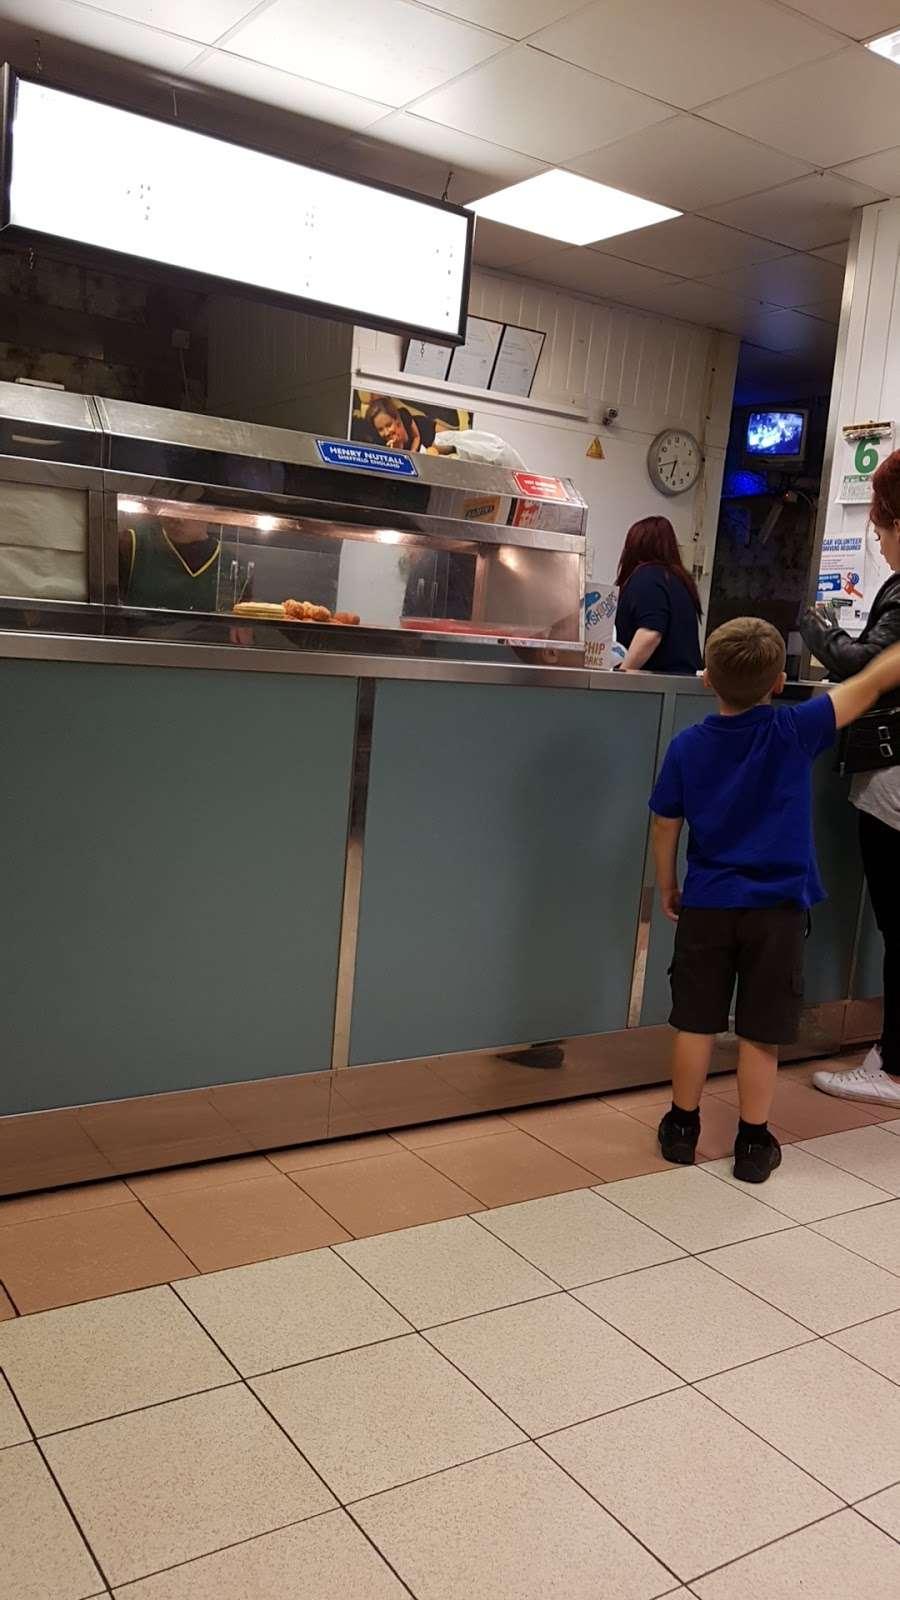 Stevenage Fish Bar - meal takeaway  | Photo 1 of 3 | Address: 5 Kenilworth Cl, Bragbury End, Stevenage SG2 8TB, UK | Phone: 01438 814215